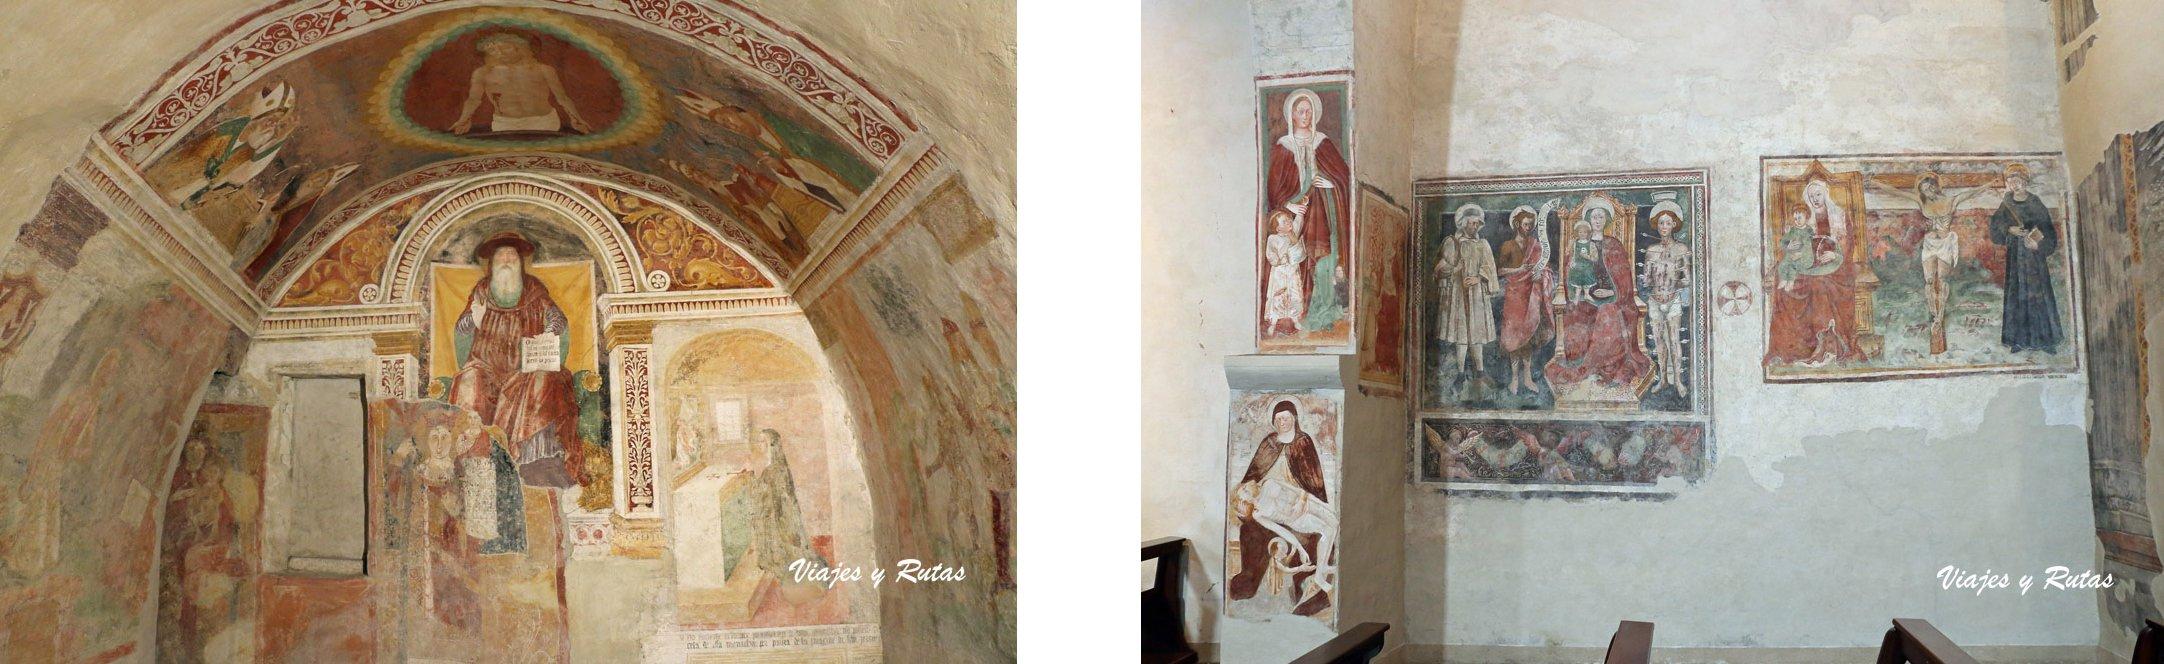 Iglesia San Miguel del pozo blanco de Bergamo